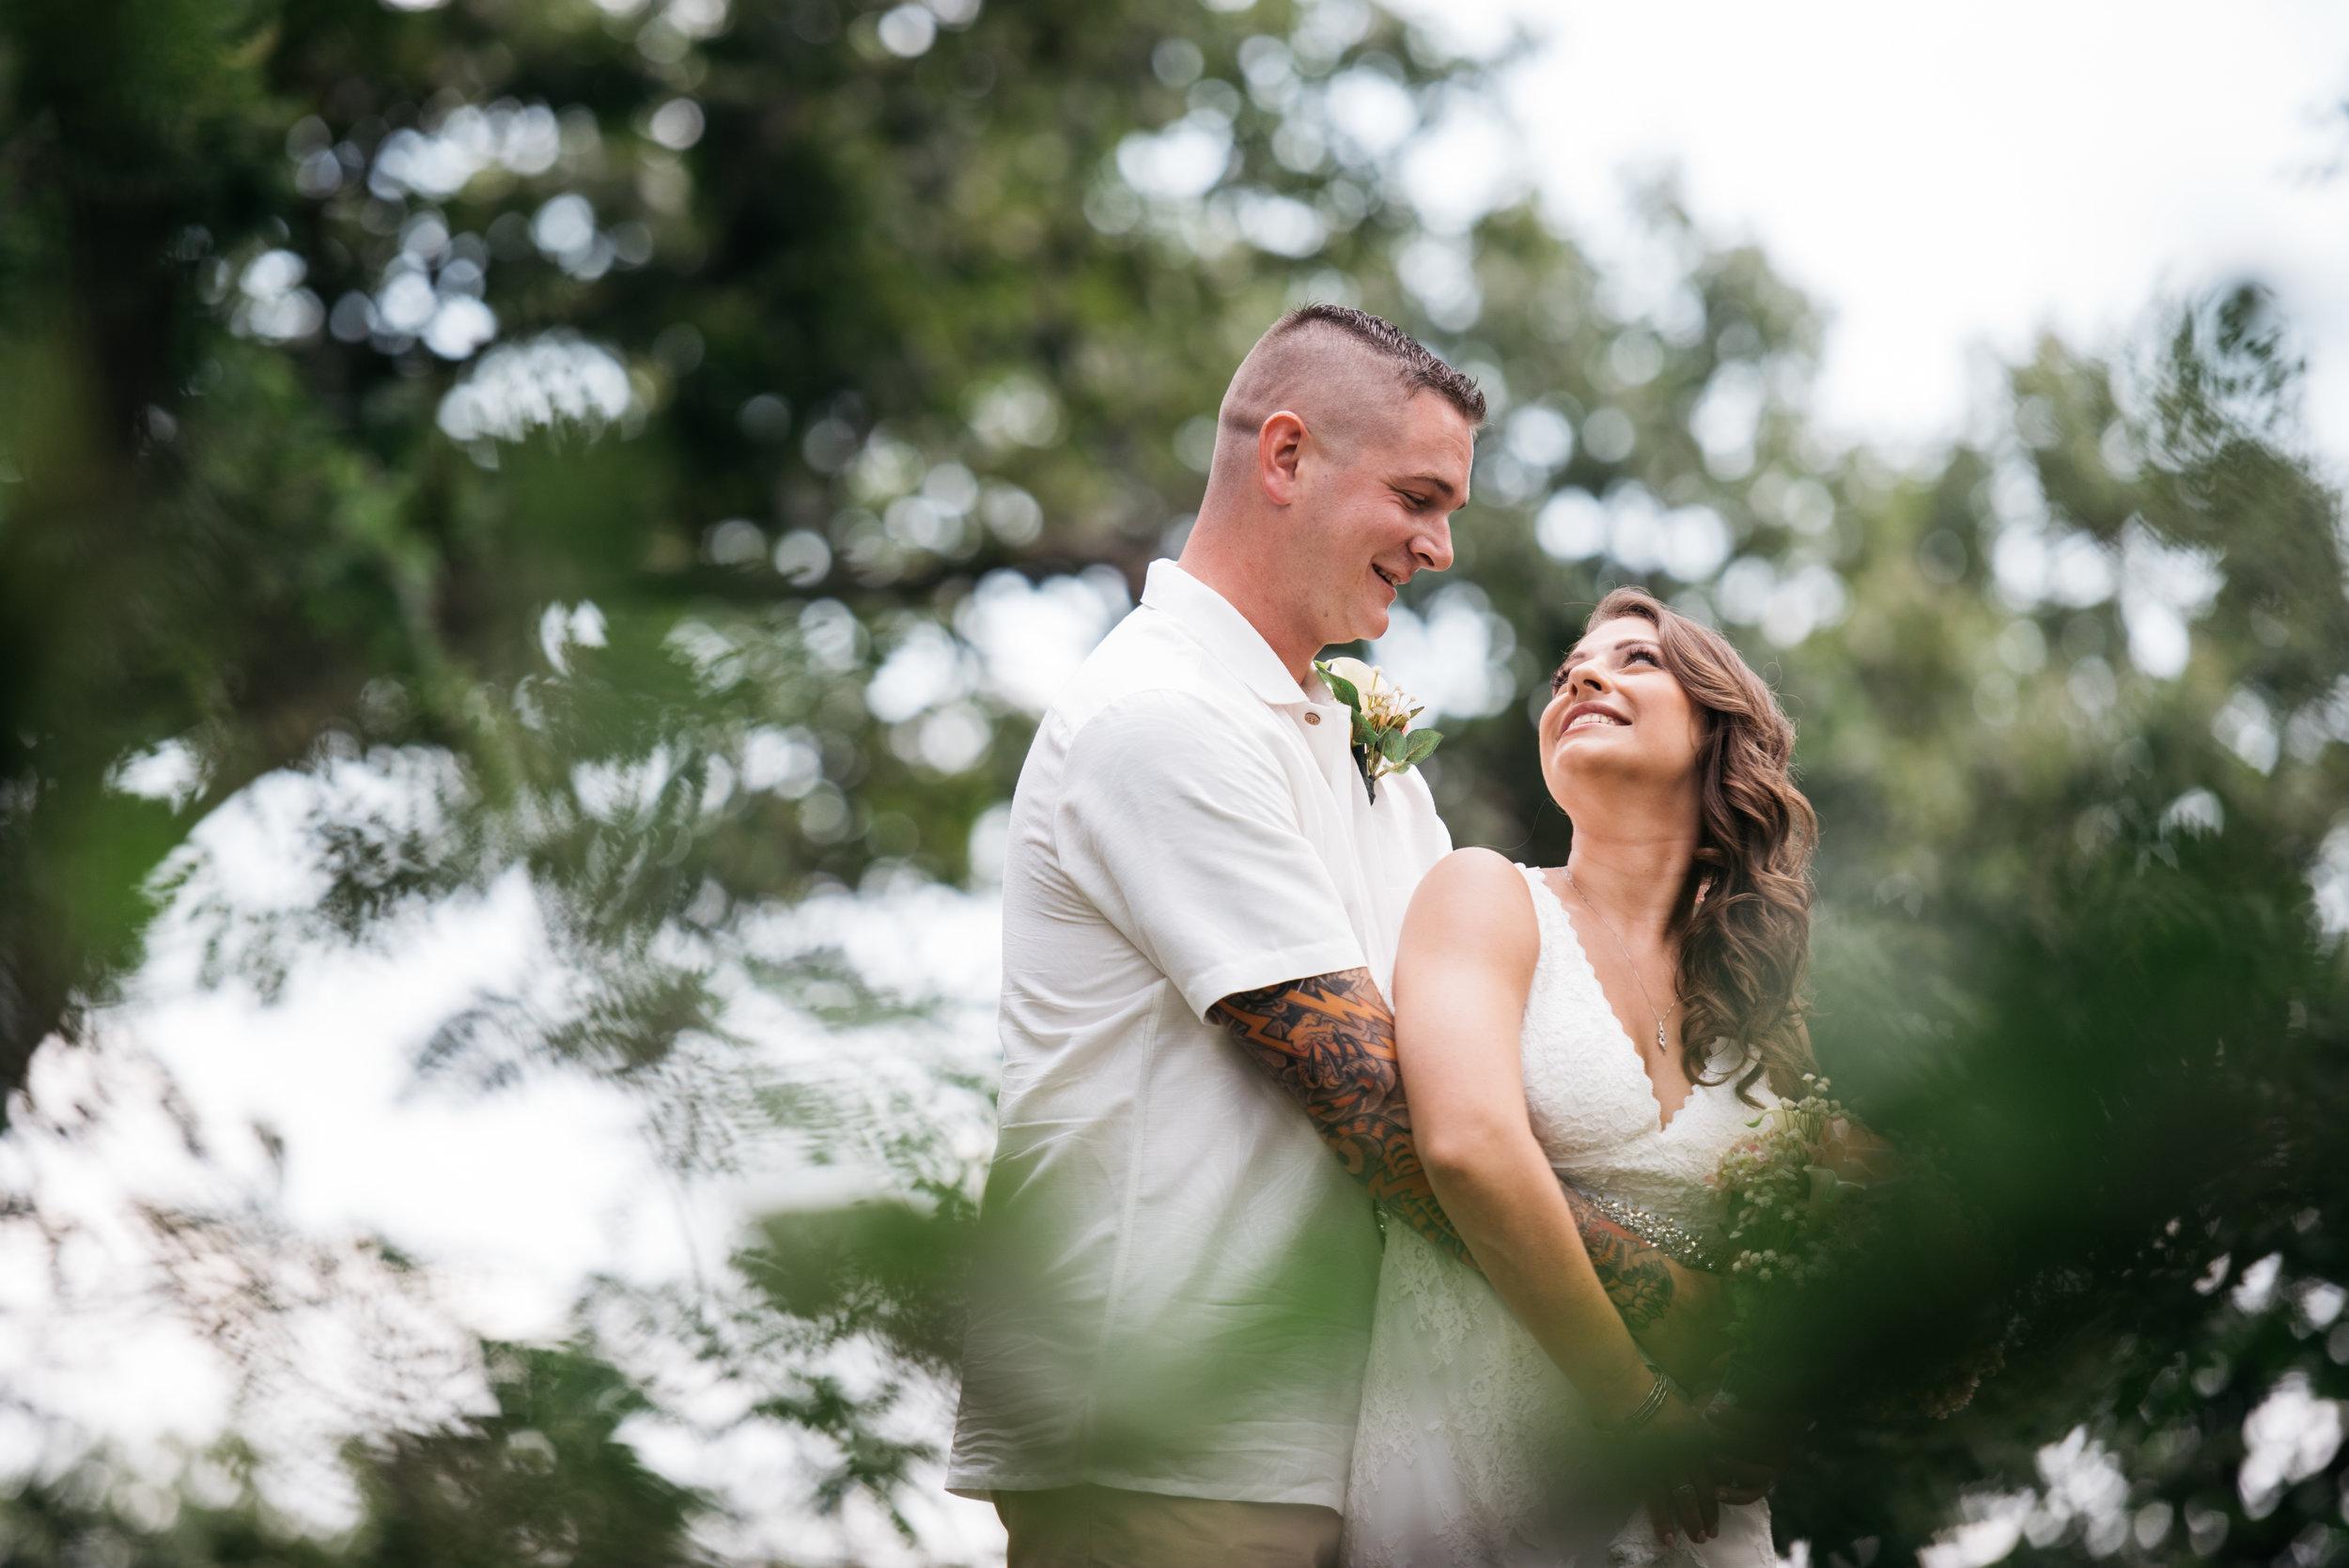 WeddingPhotos | NJPhotographer | Highlights-2-30.jpg